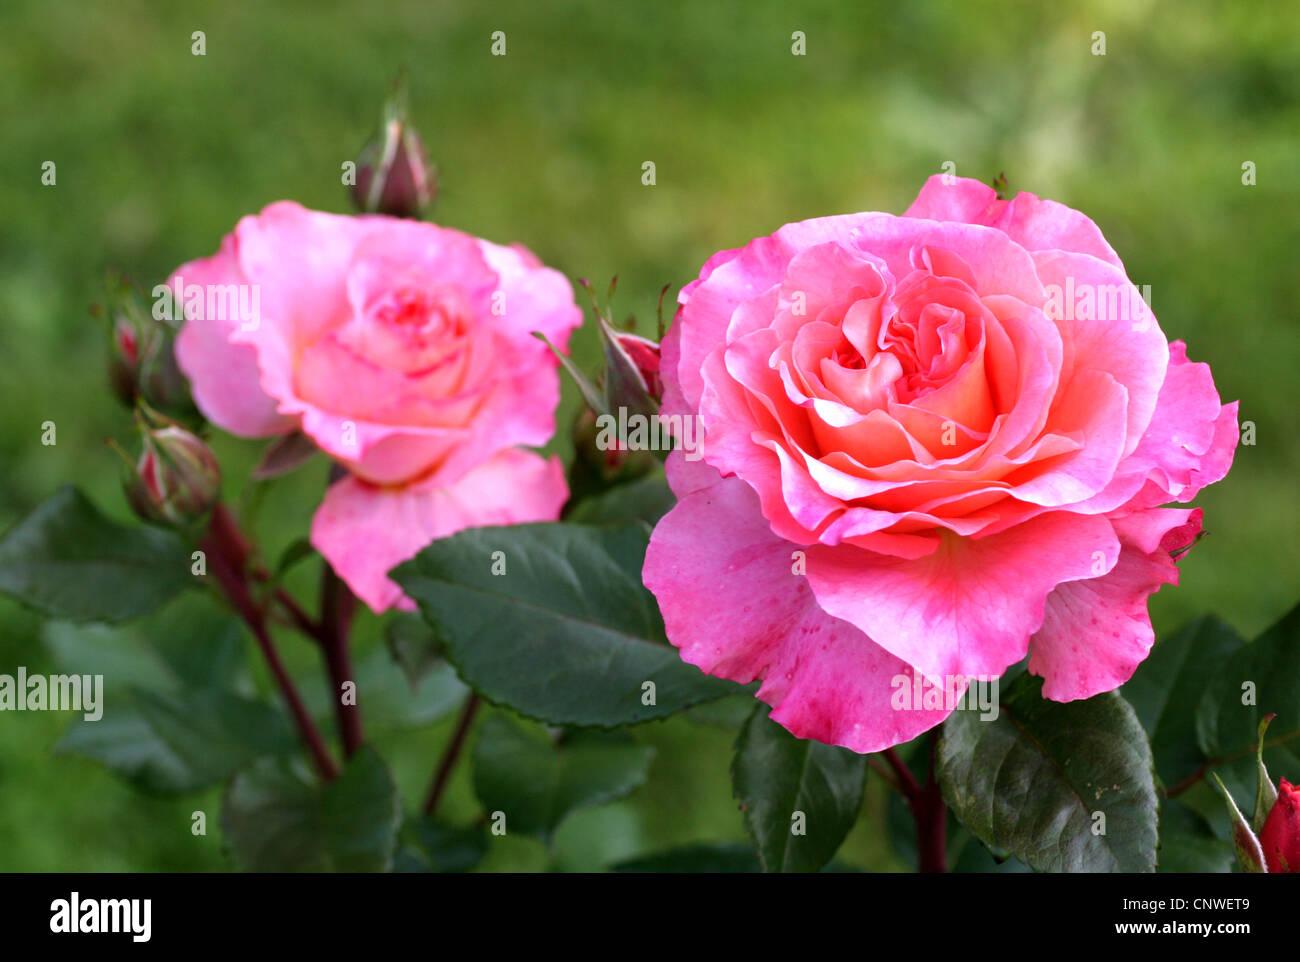 ornamental rose rosa 39 augusta luise 39 rosa augusta luise. Black Bedroom Furniture Sets. Home Design Ideas